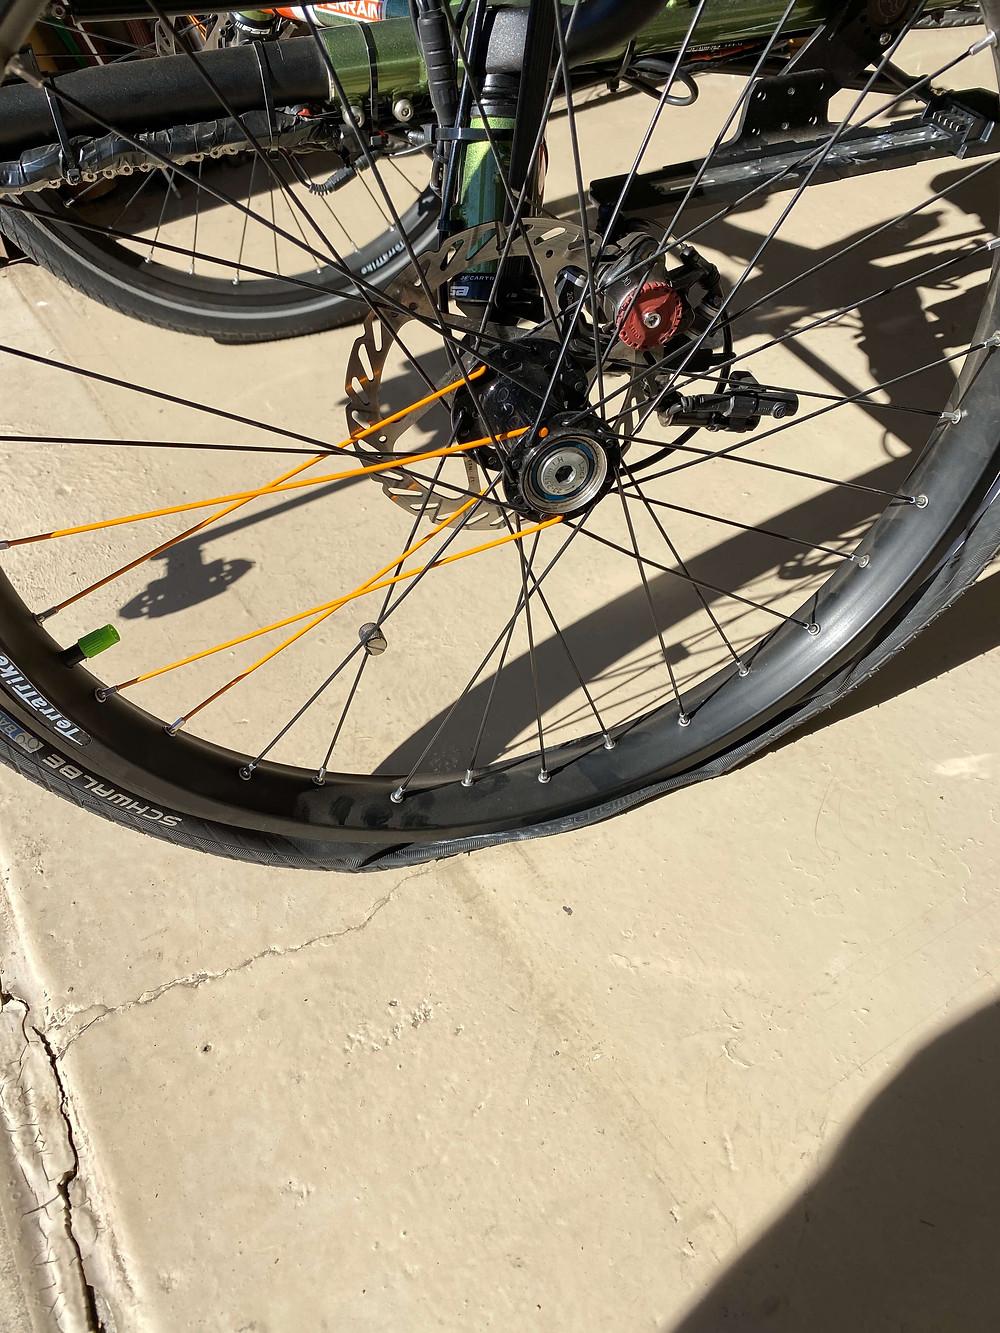 Jeff's flat tire on this TerraTrike Rambler All Terrain